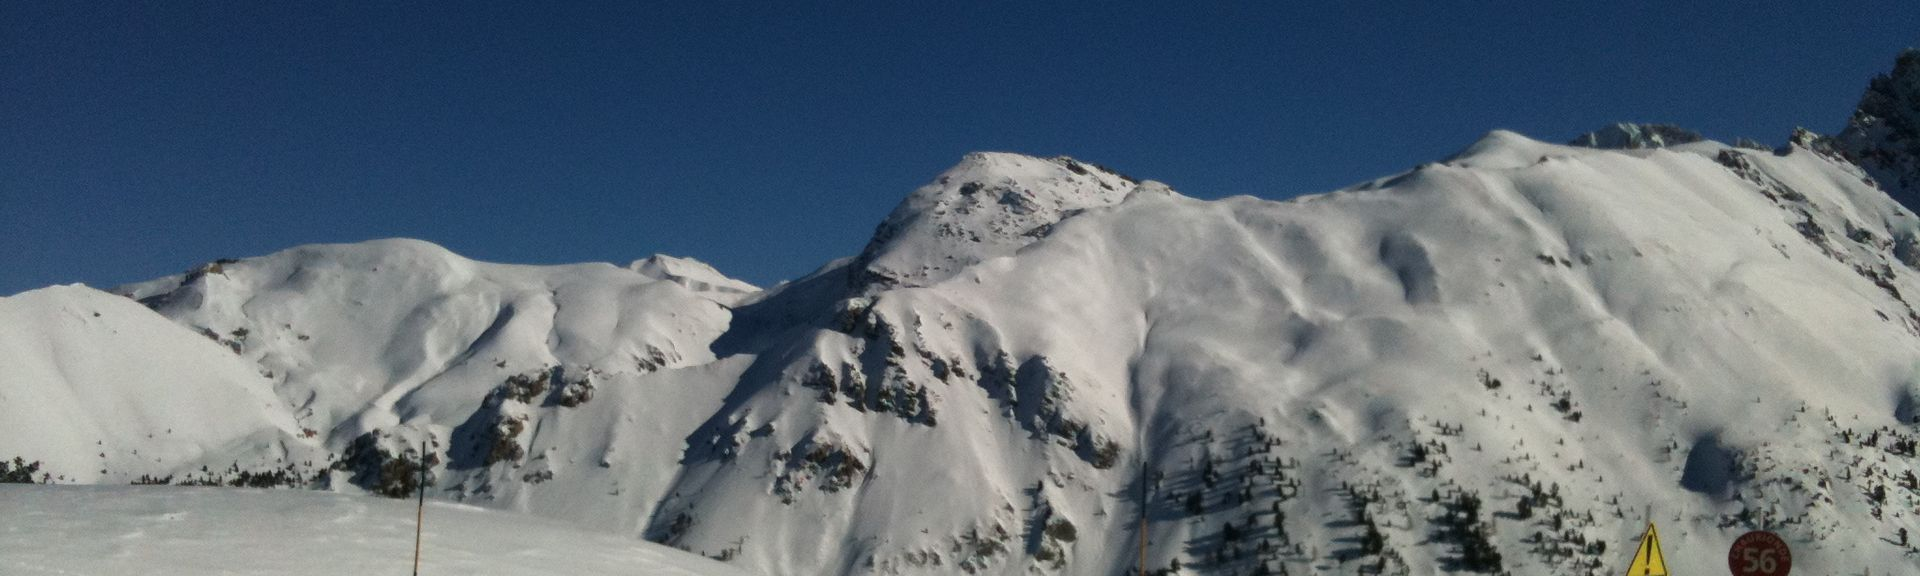 Pure Snowschool, Vars, Hautes-Alpes, France